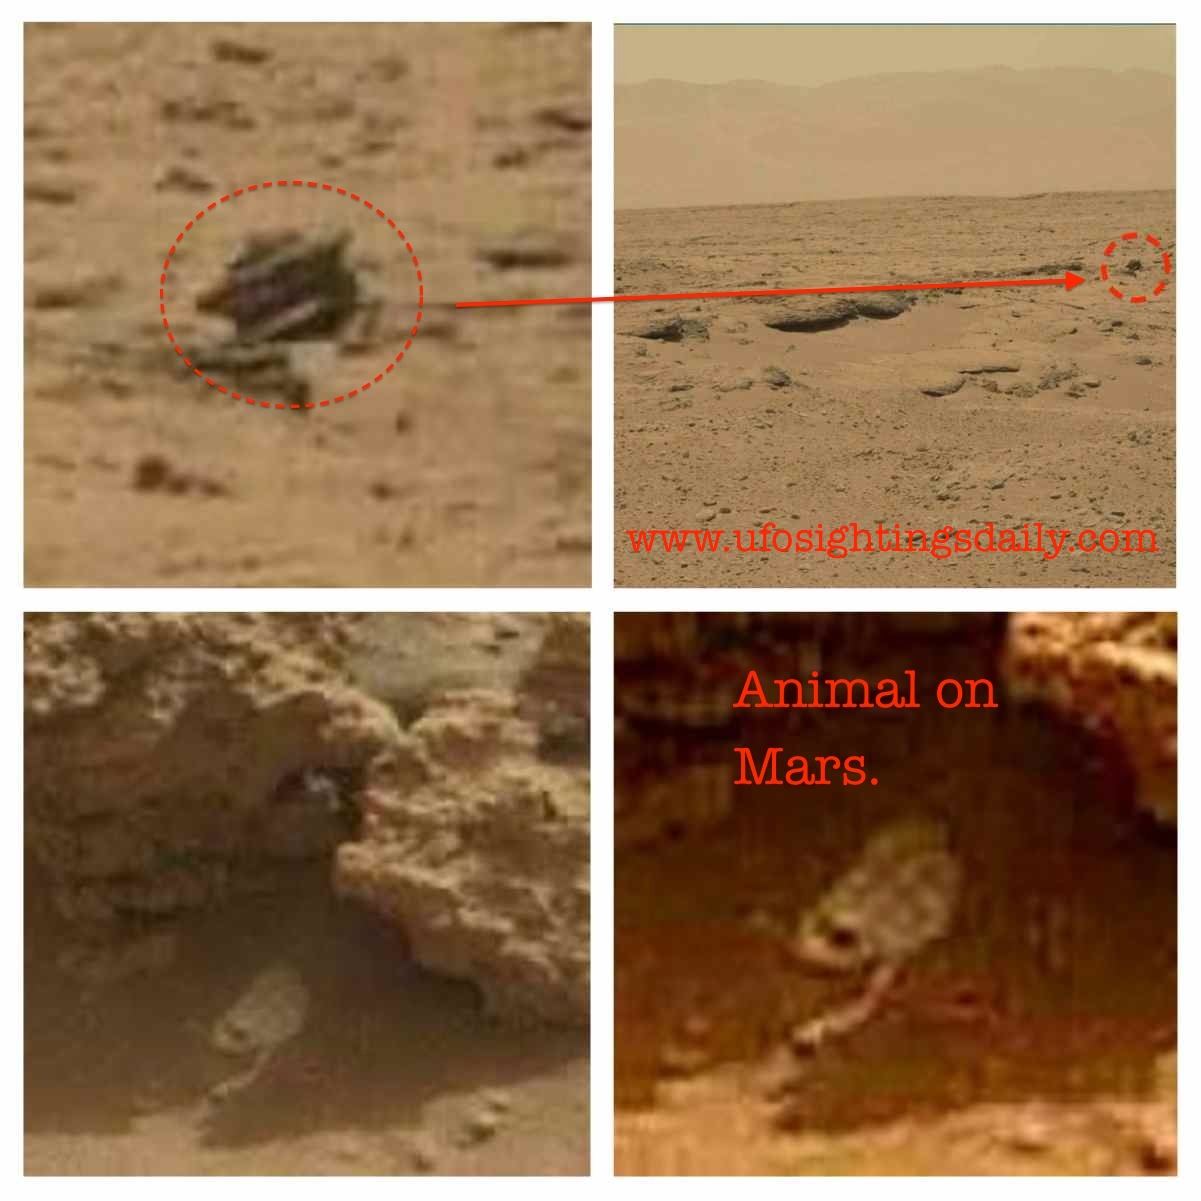 aliens from mars - photo #41